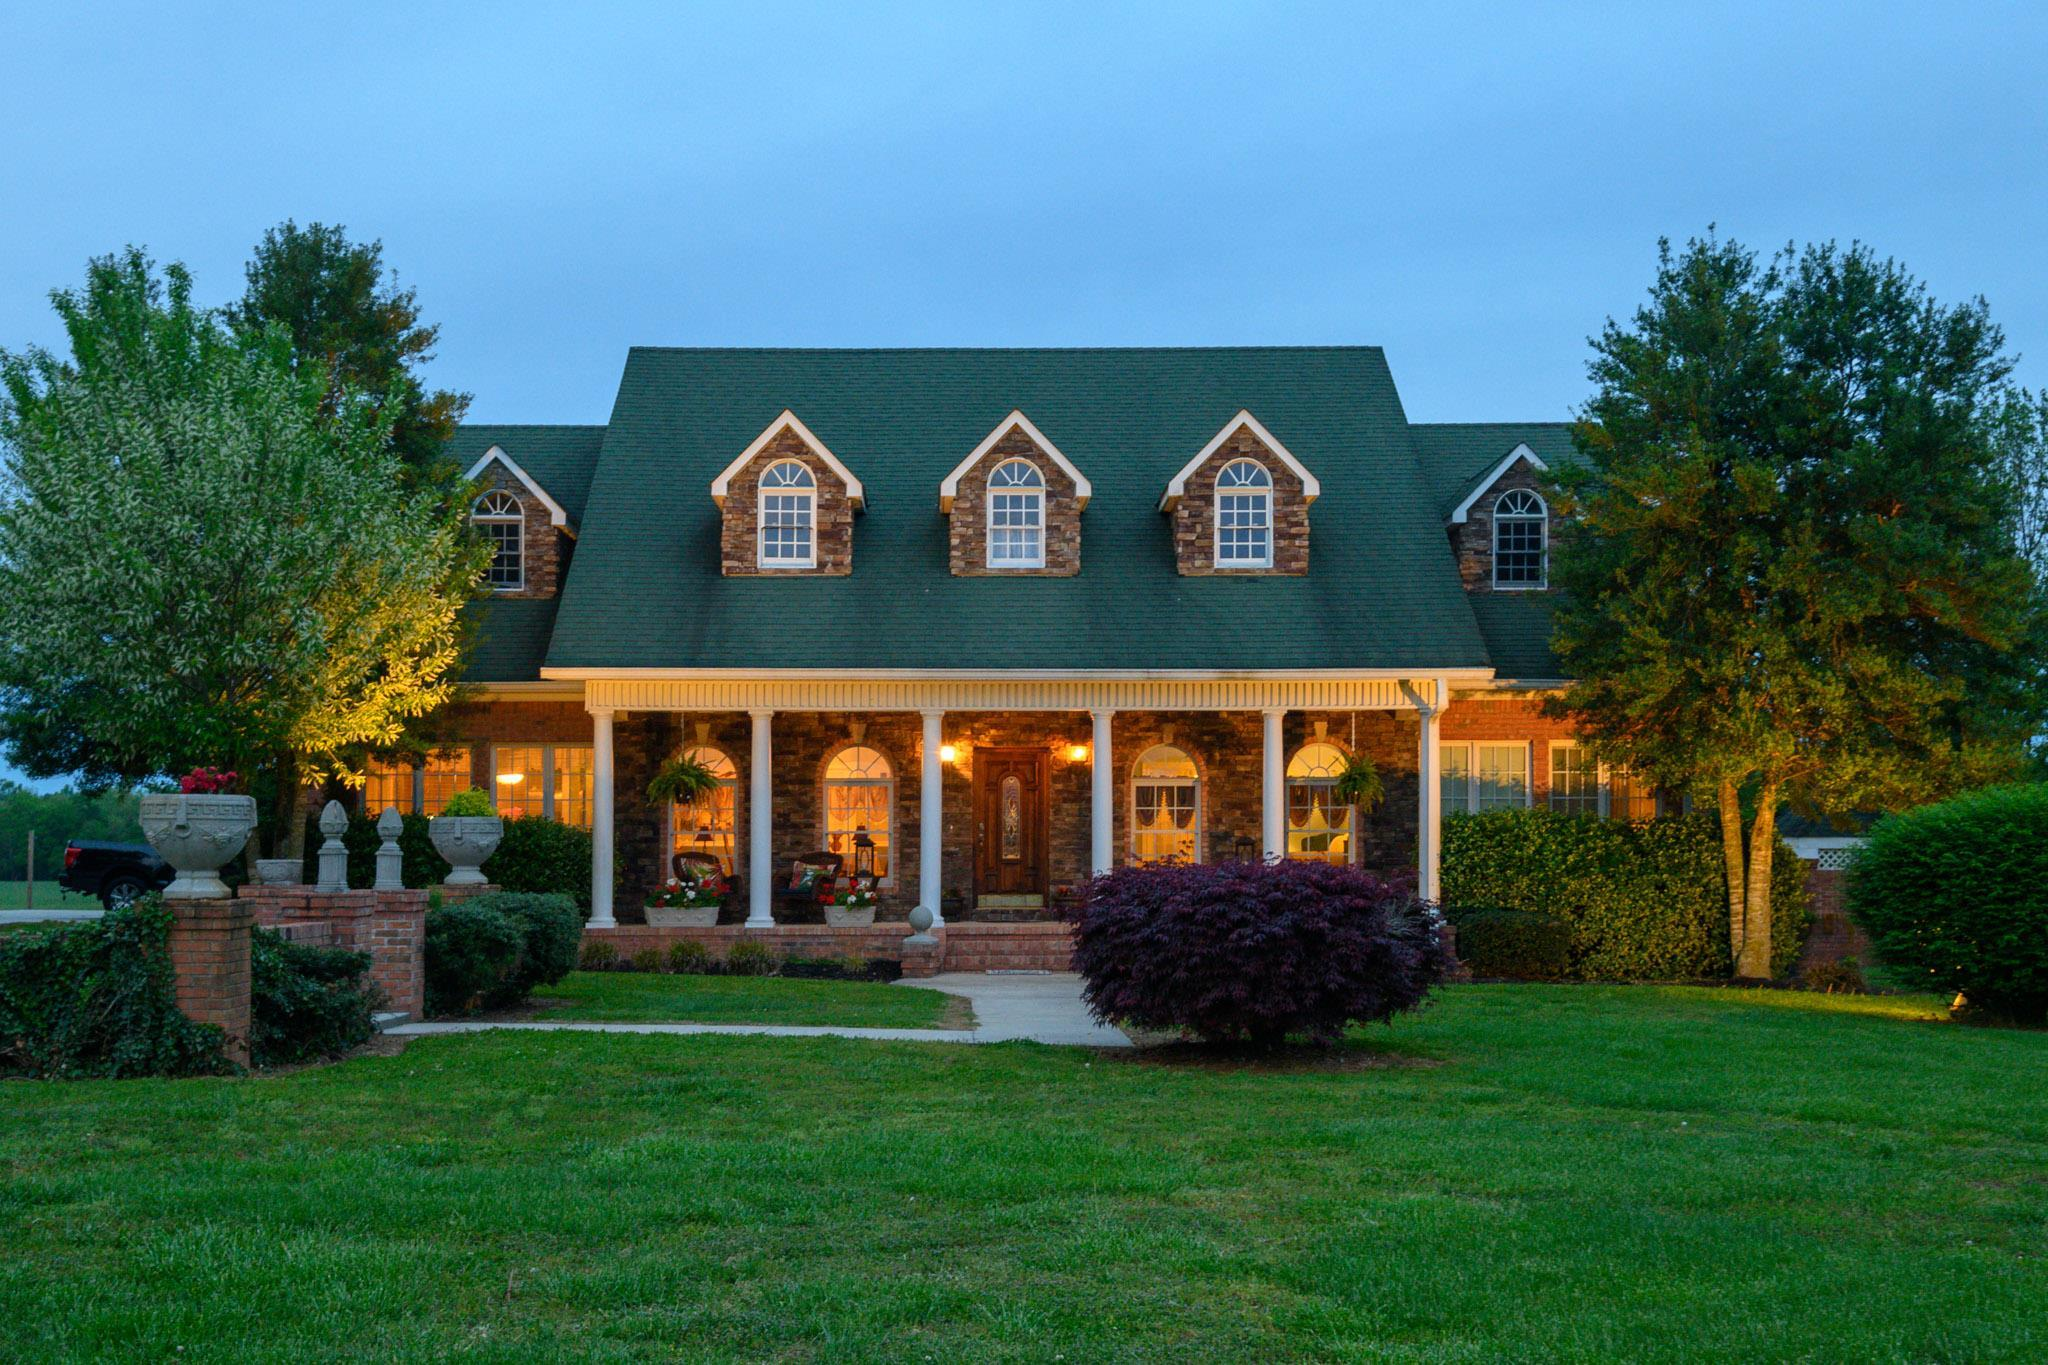 118 Maupin Cir, Shelbyville, TN 37160 - Shelbyville, TN real estate listing